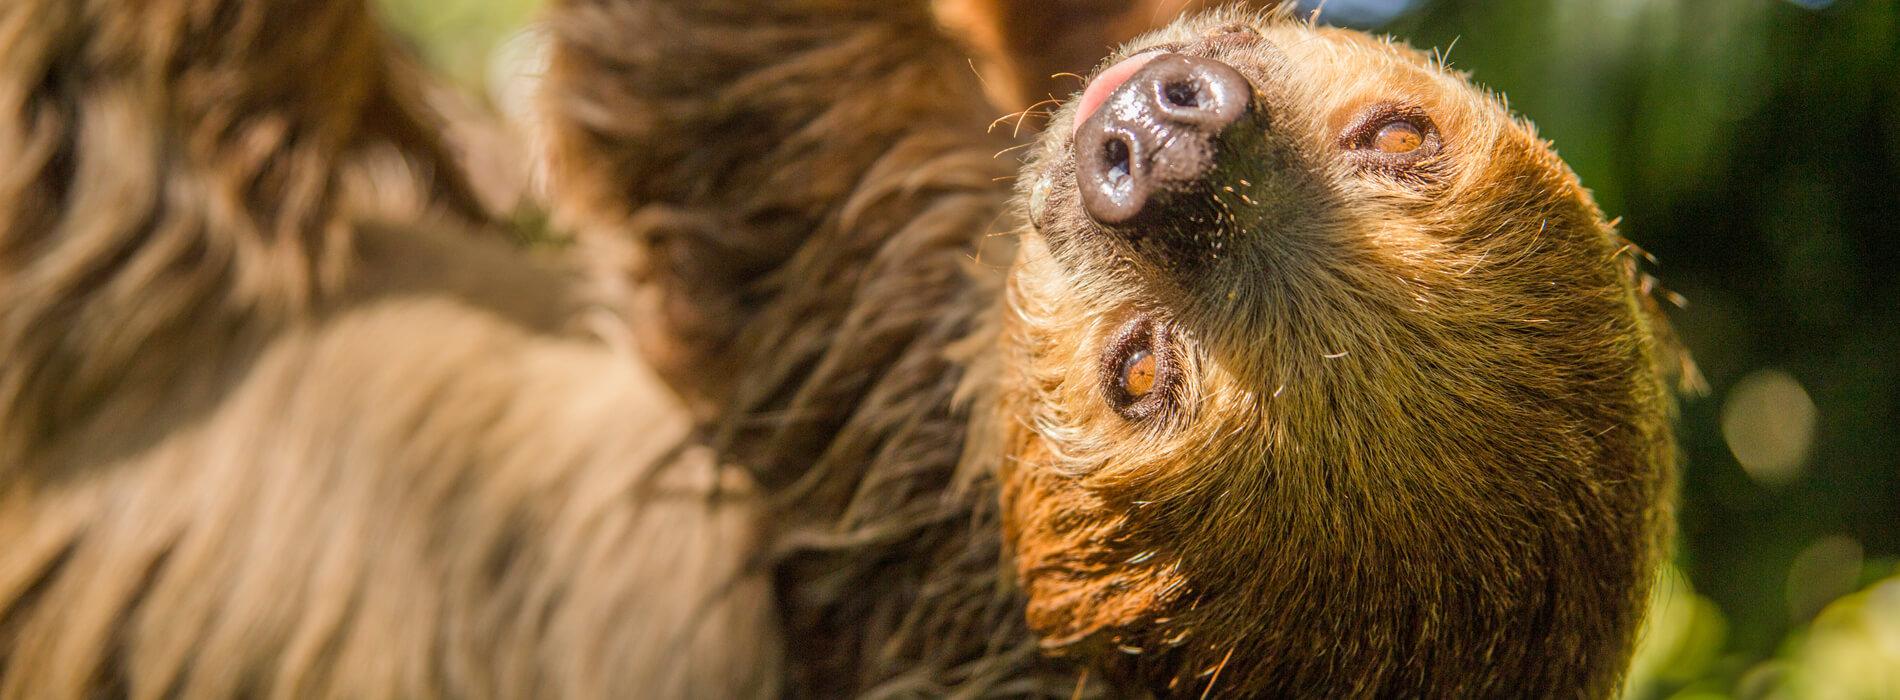 Sloths at Busch Gardens Tampa Bay